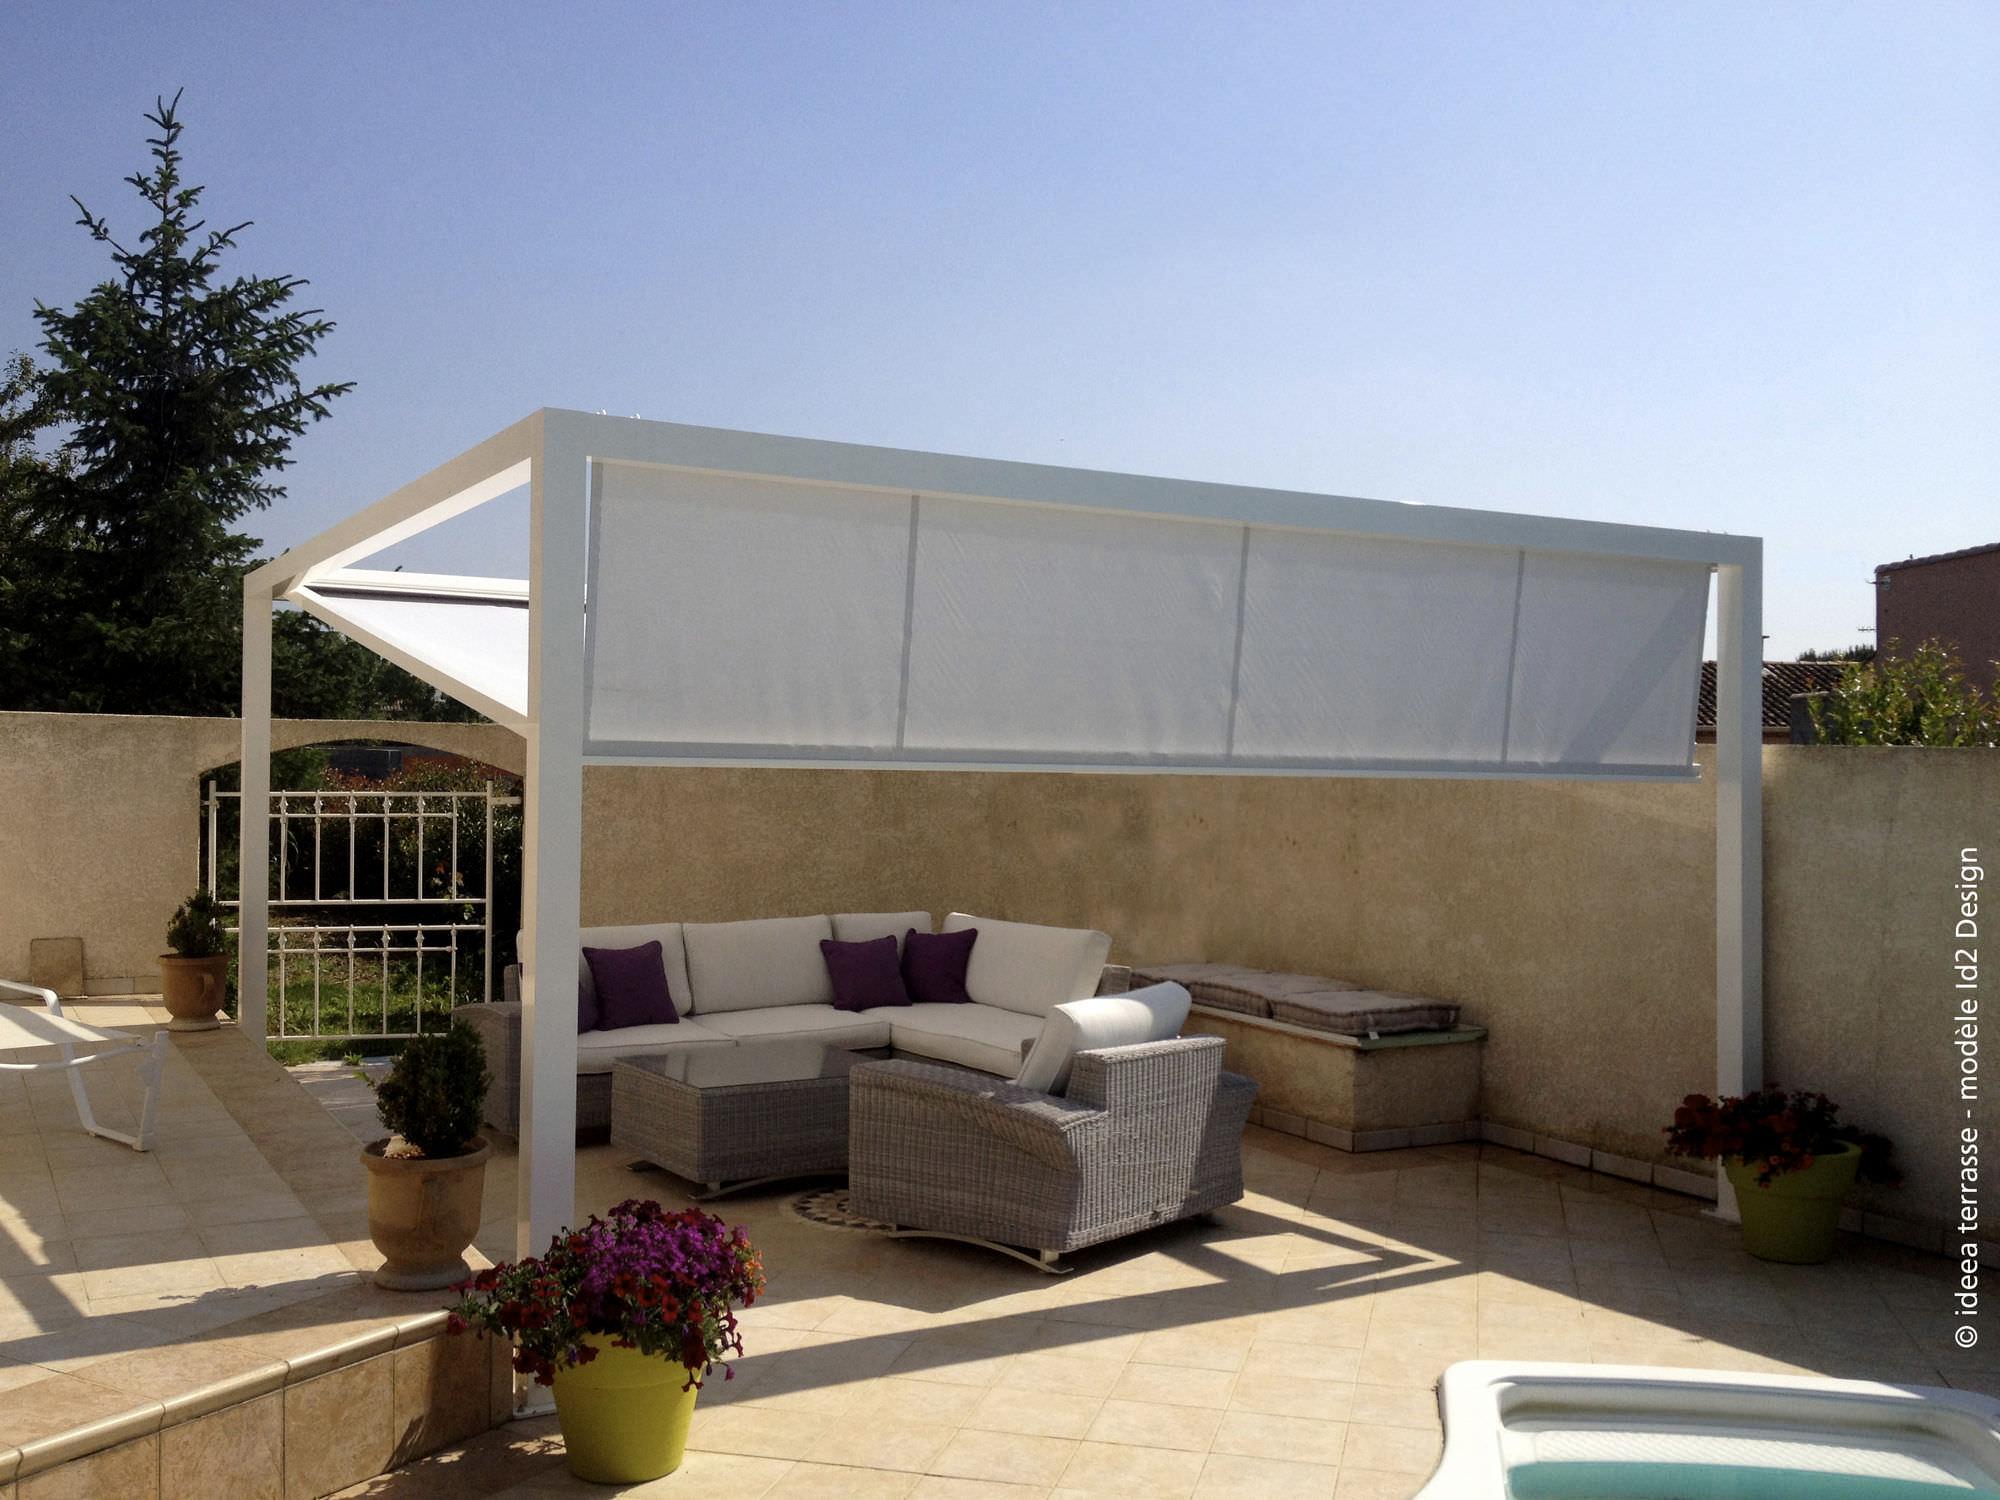 terrasse pergola design nos conseils. Black Bedroom Furniture Sets. Home Design Ideas